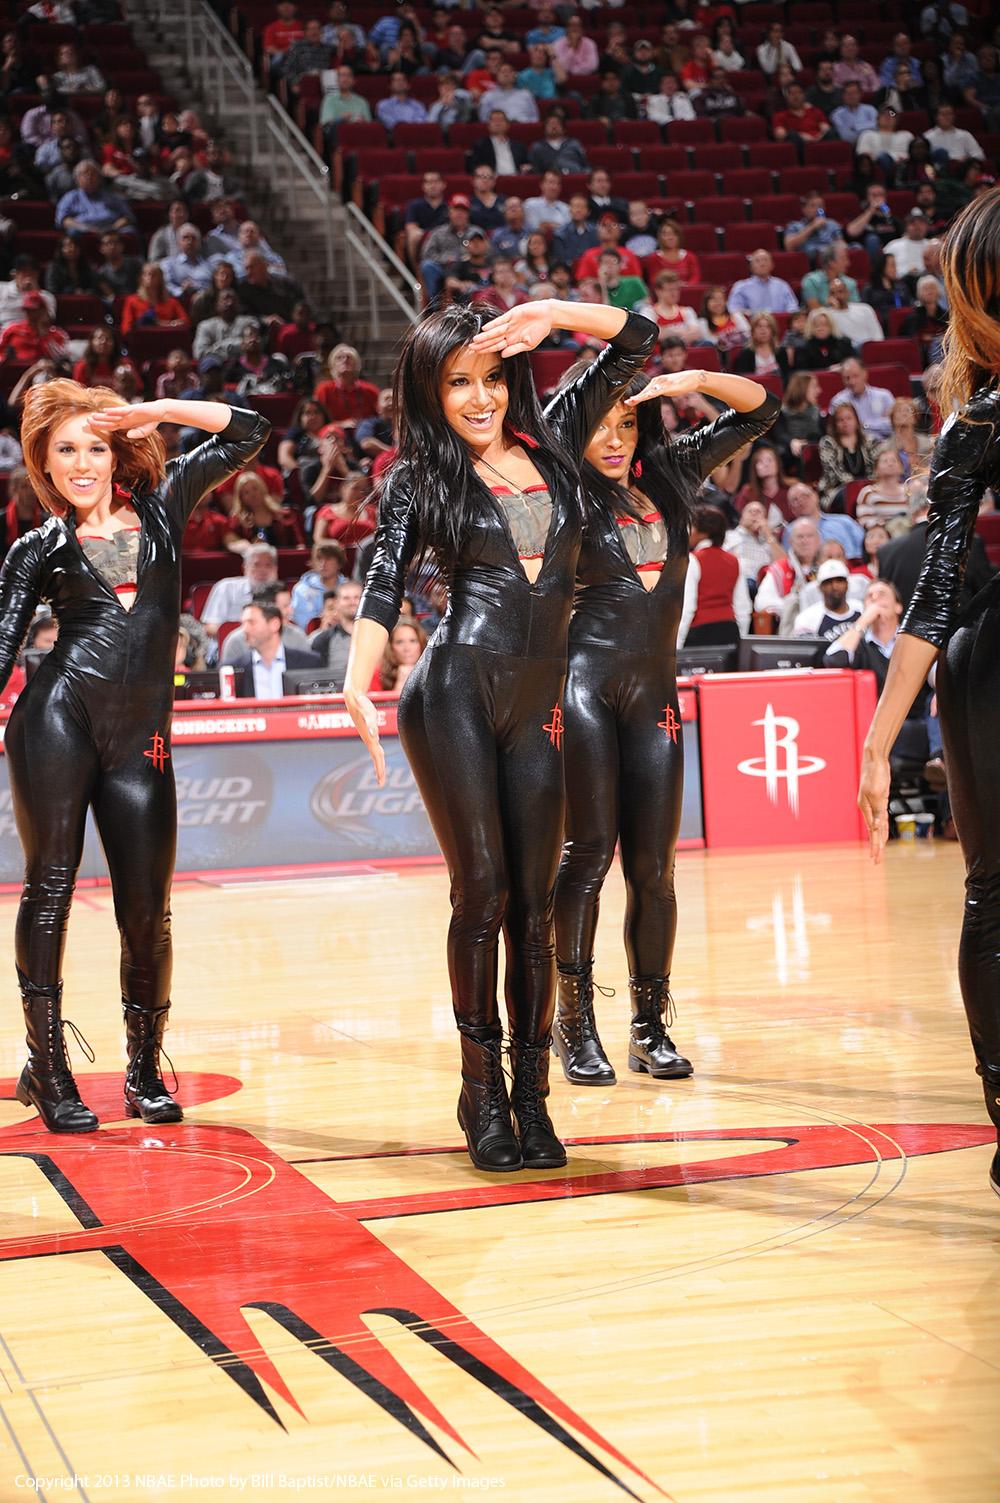 Rockets Dancers en viva basquet